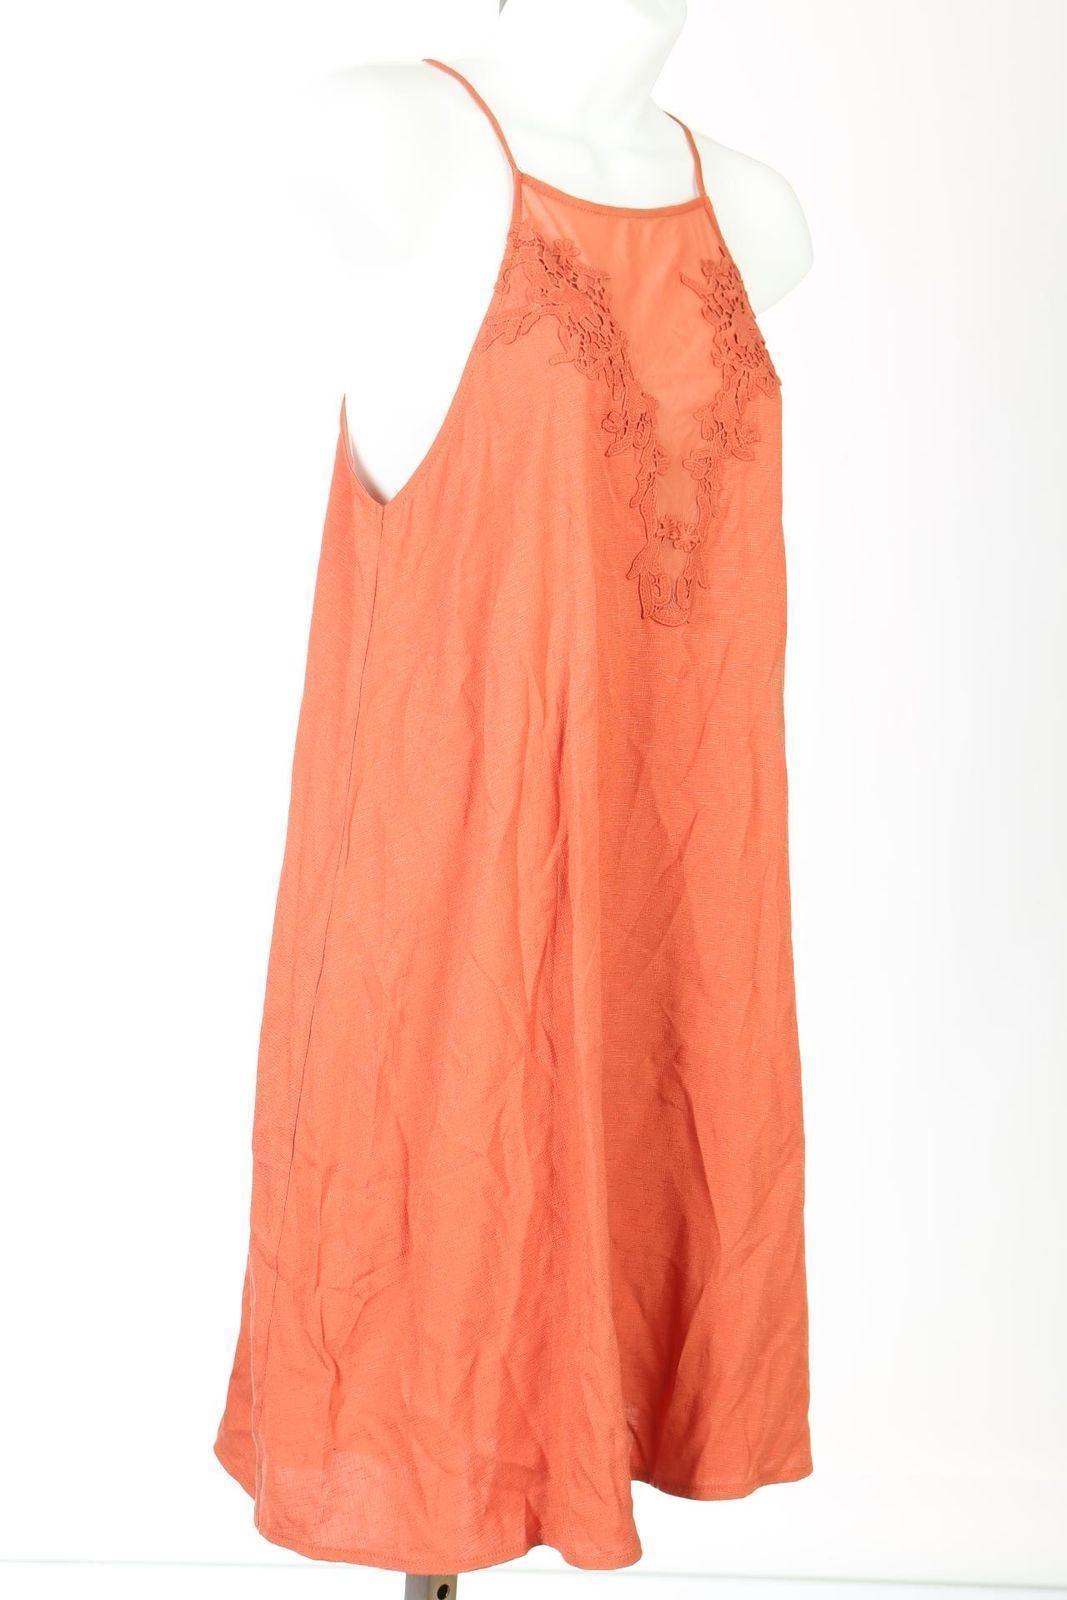 Lush Mixed Media Square Neck Shift Dress Orange Sz Medium M NWOT B52